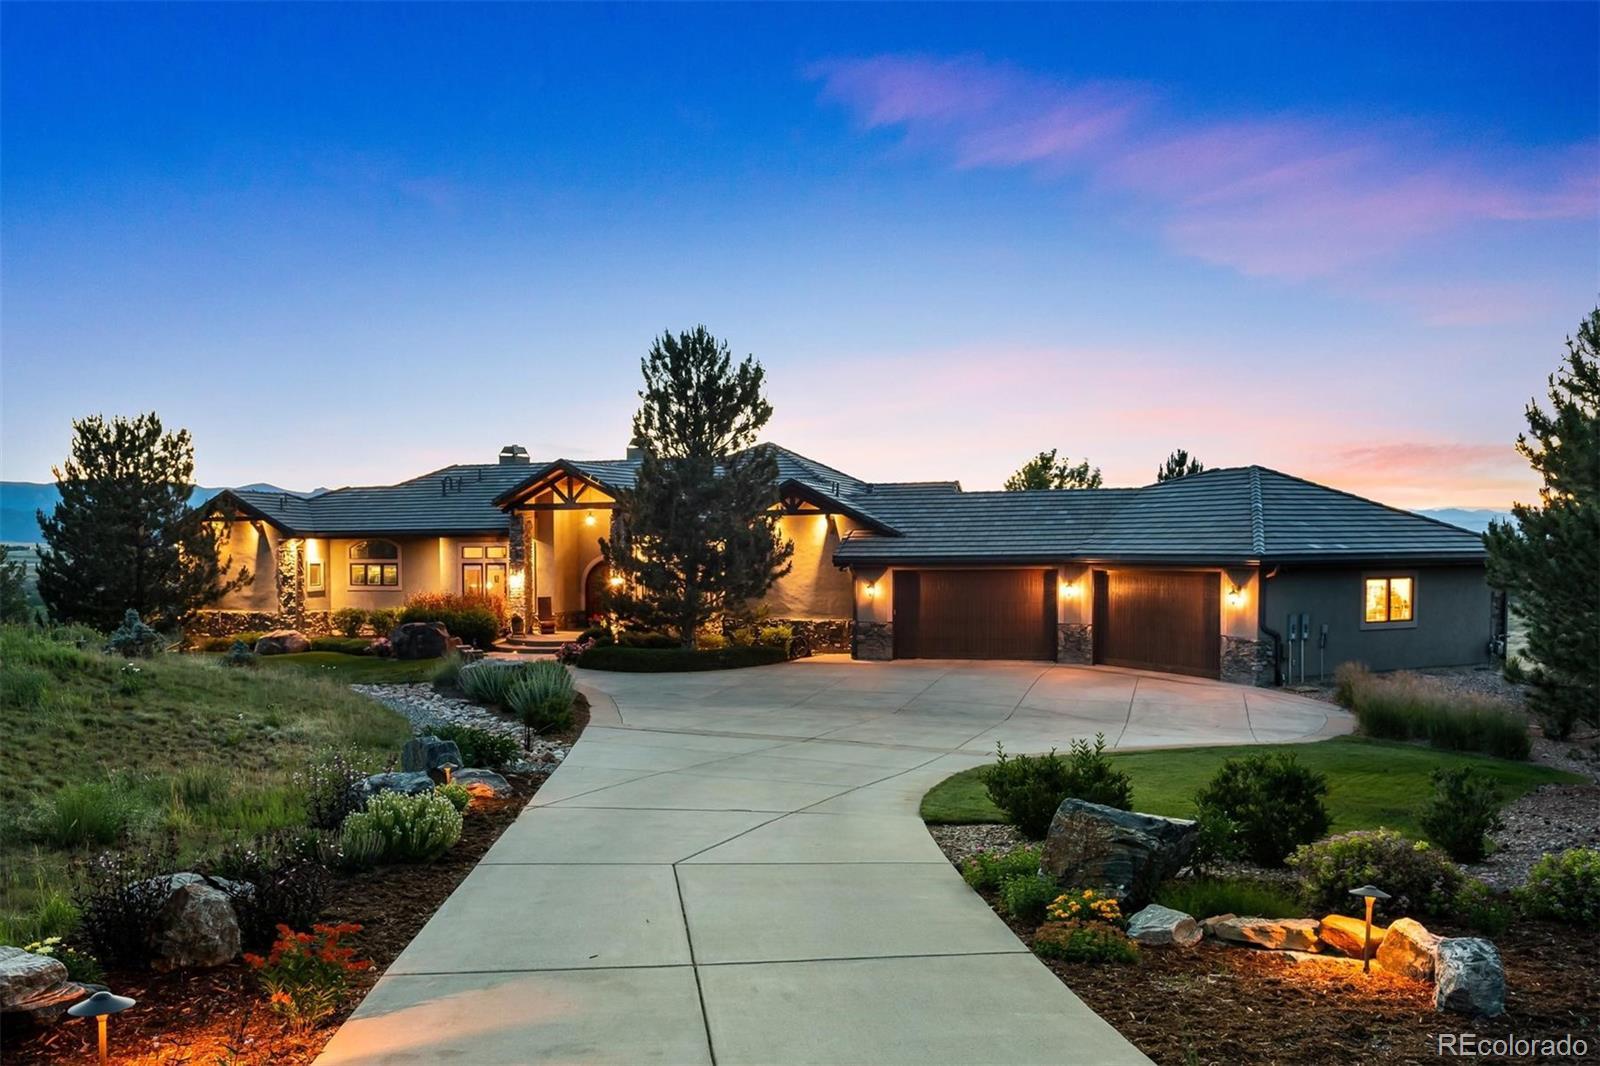 MLS# 5927115 - 3 - 5585 Aspen Leaf Place, Littleton, CO 80125